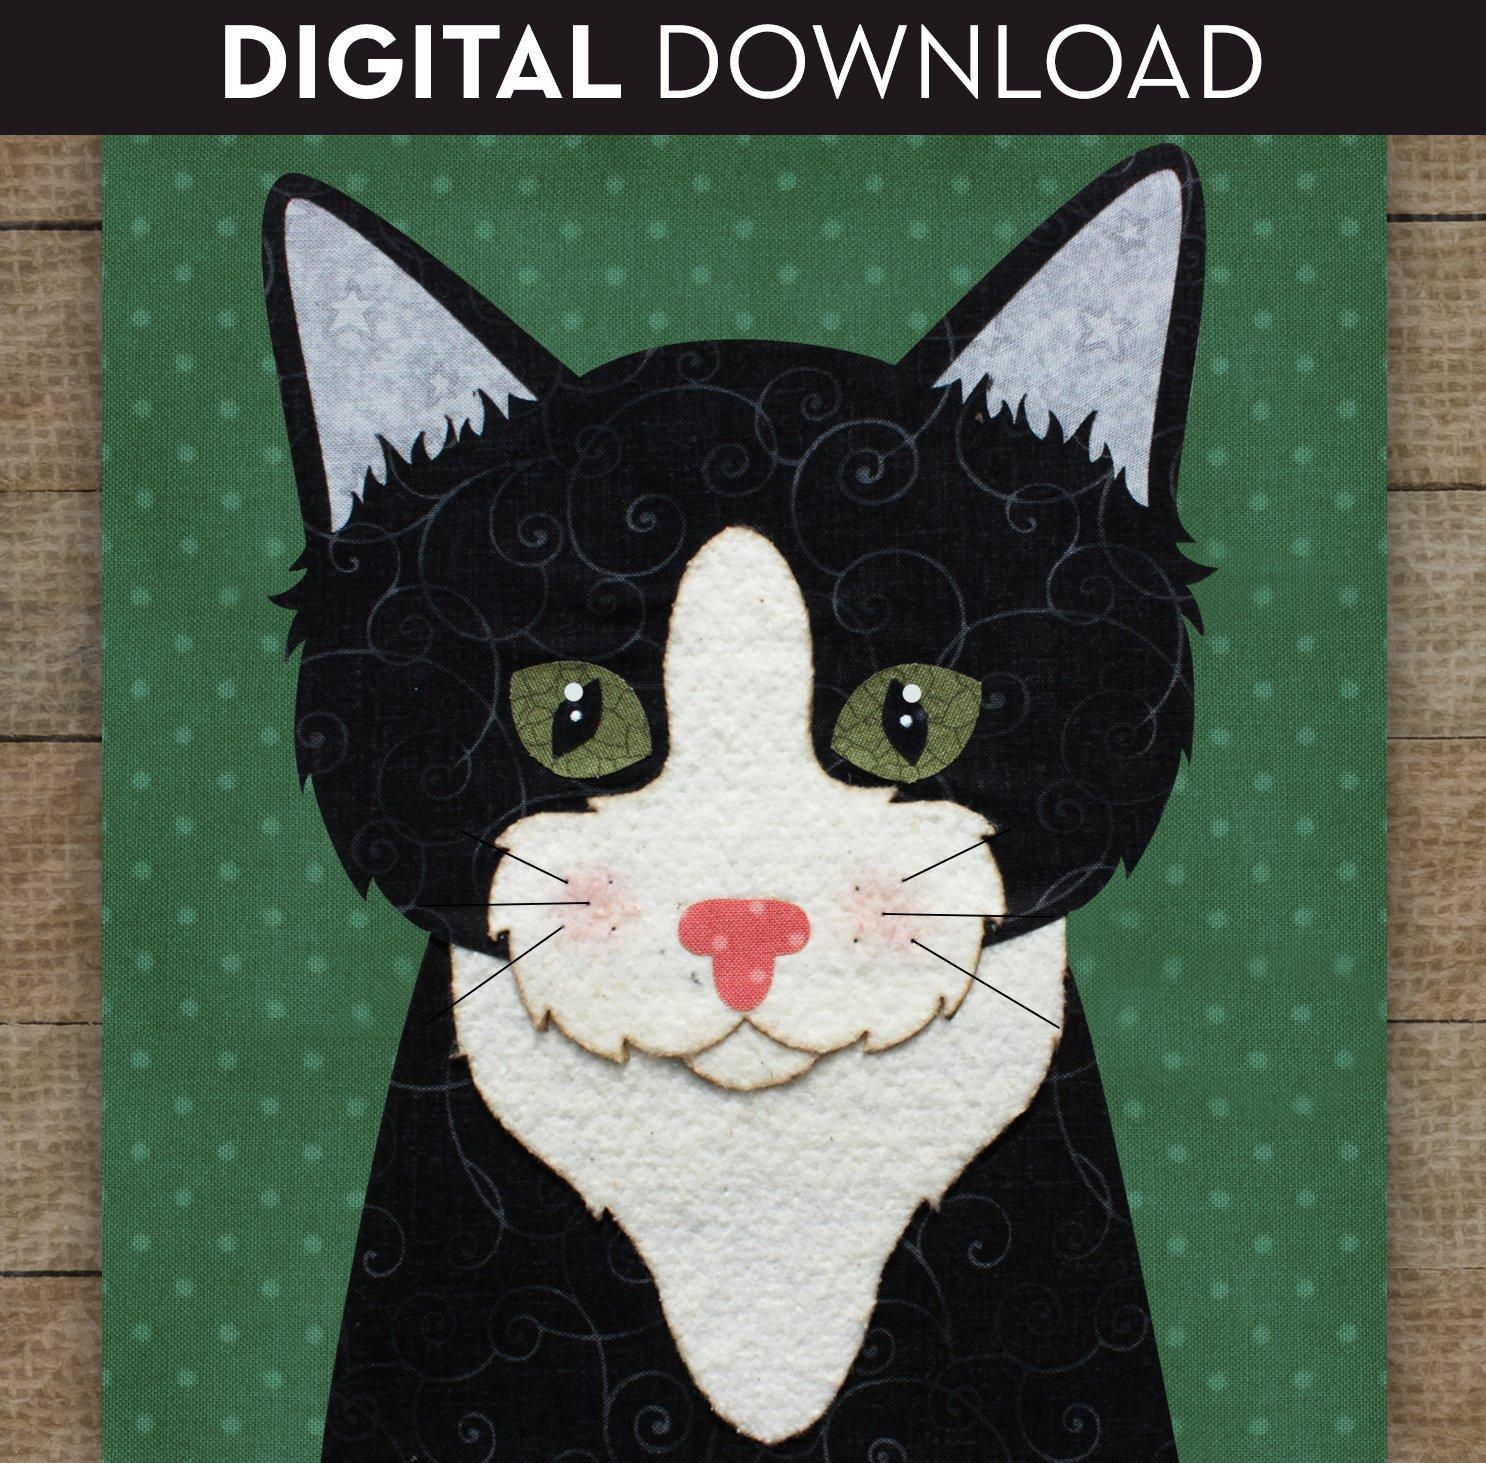 Tuxedo Cat 2 - Download